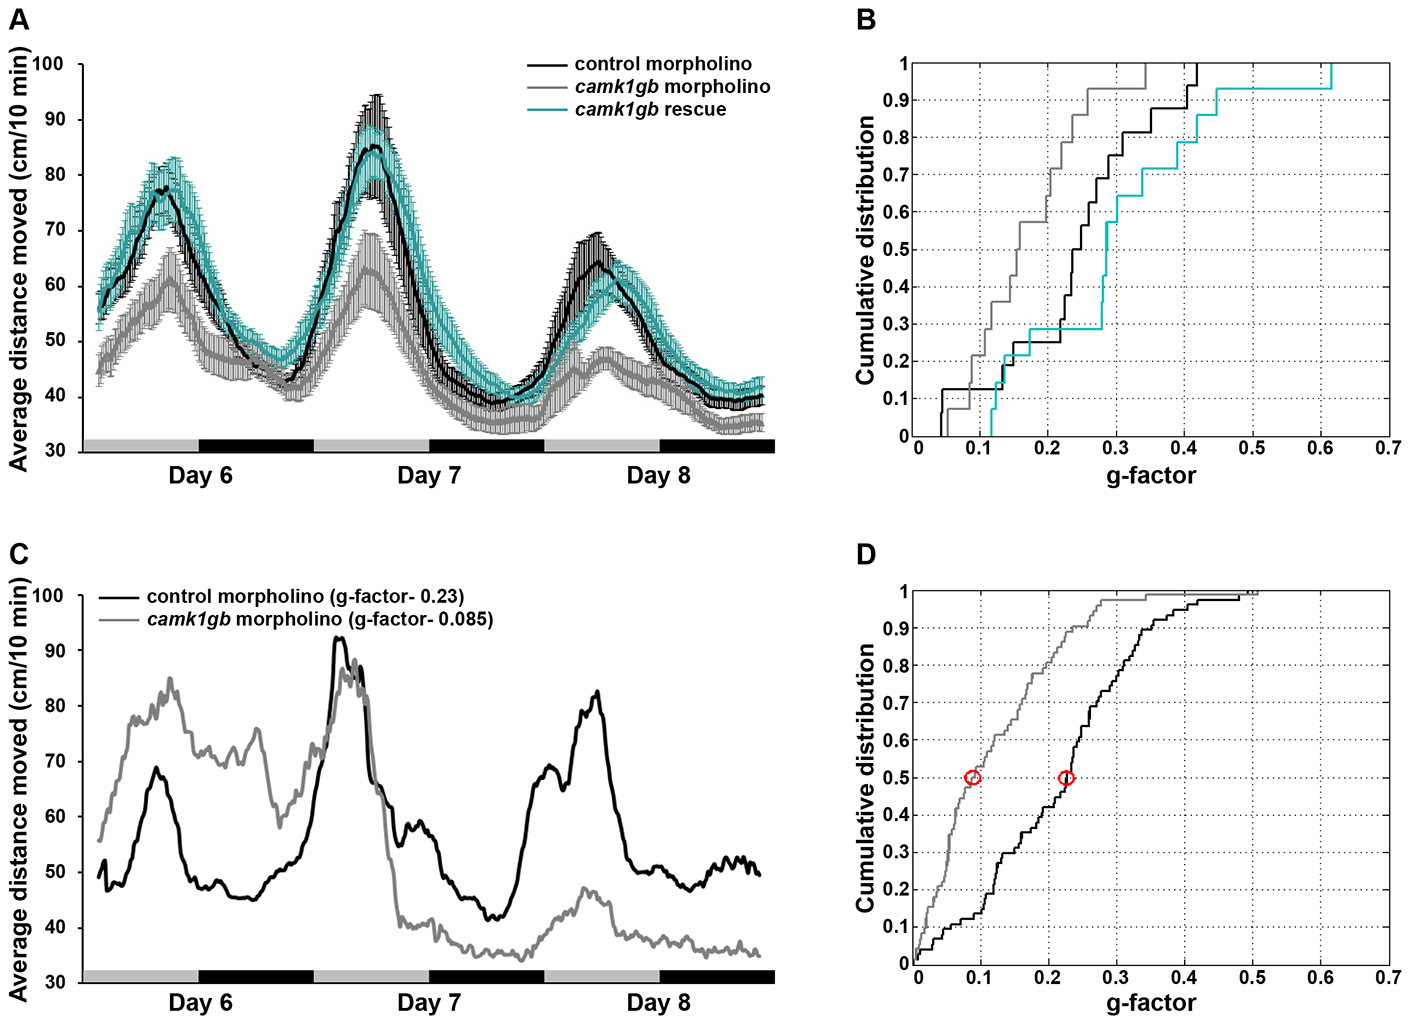 The effect of <i>camk1gb</i> knockdown on larval locomotor activity rhythms.